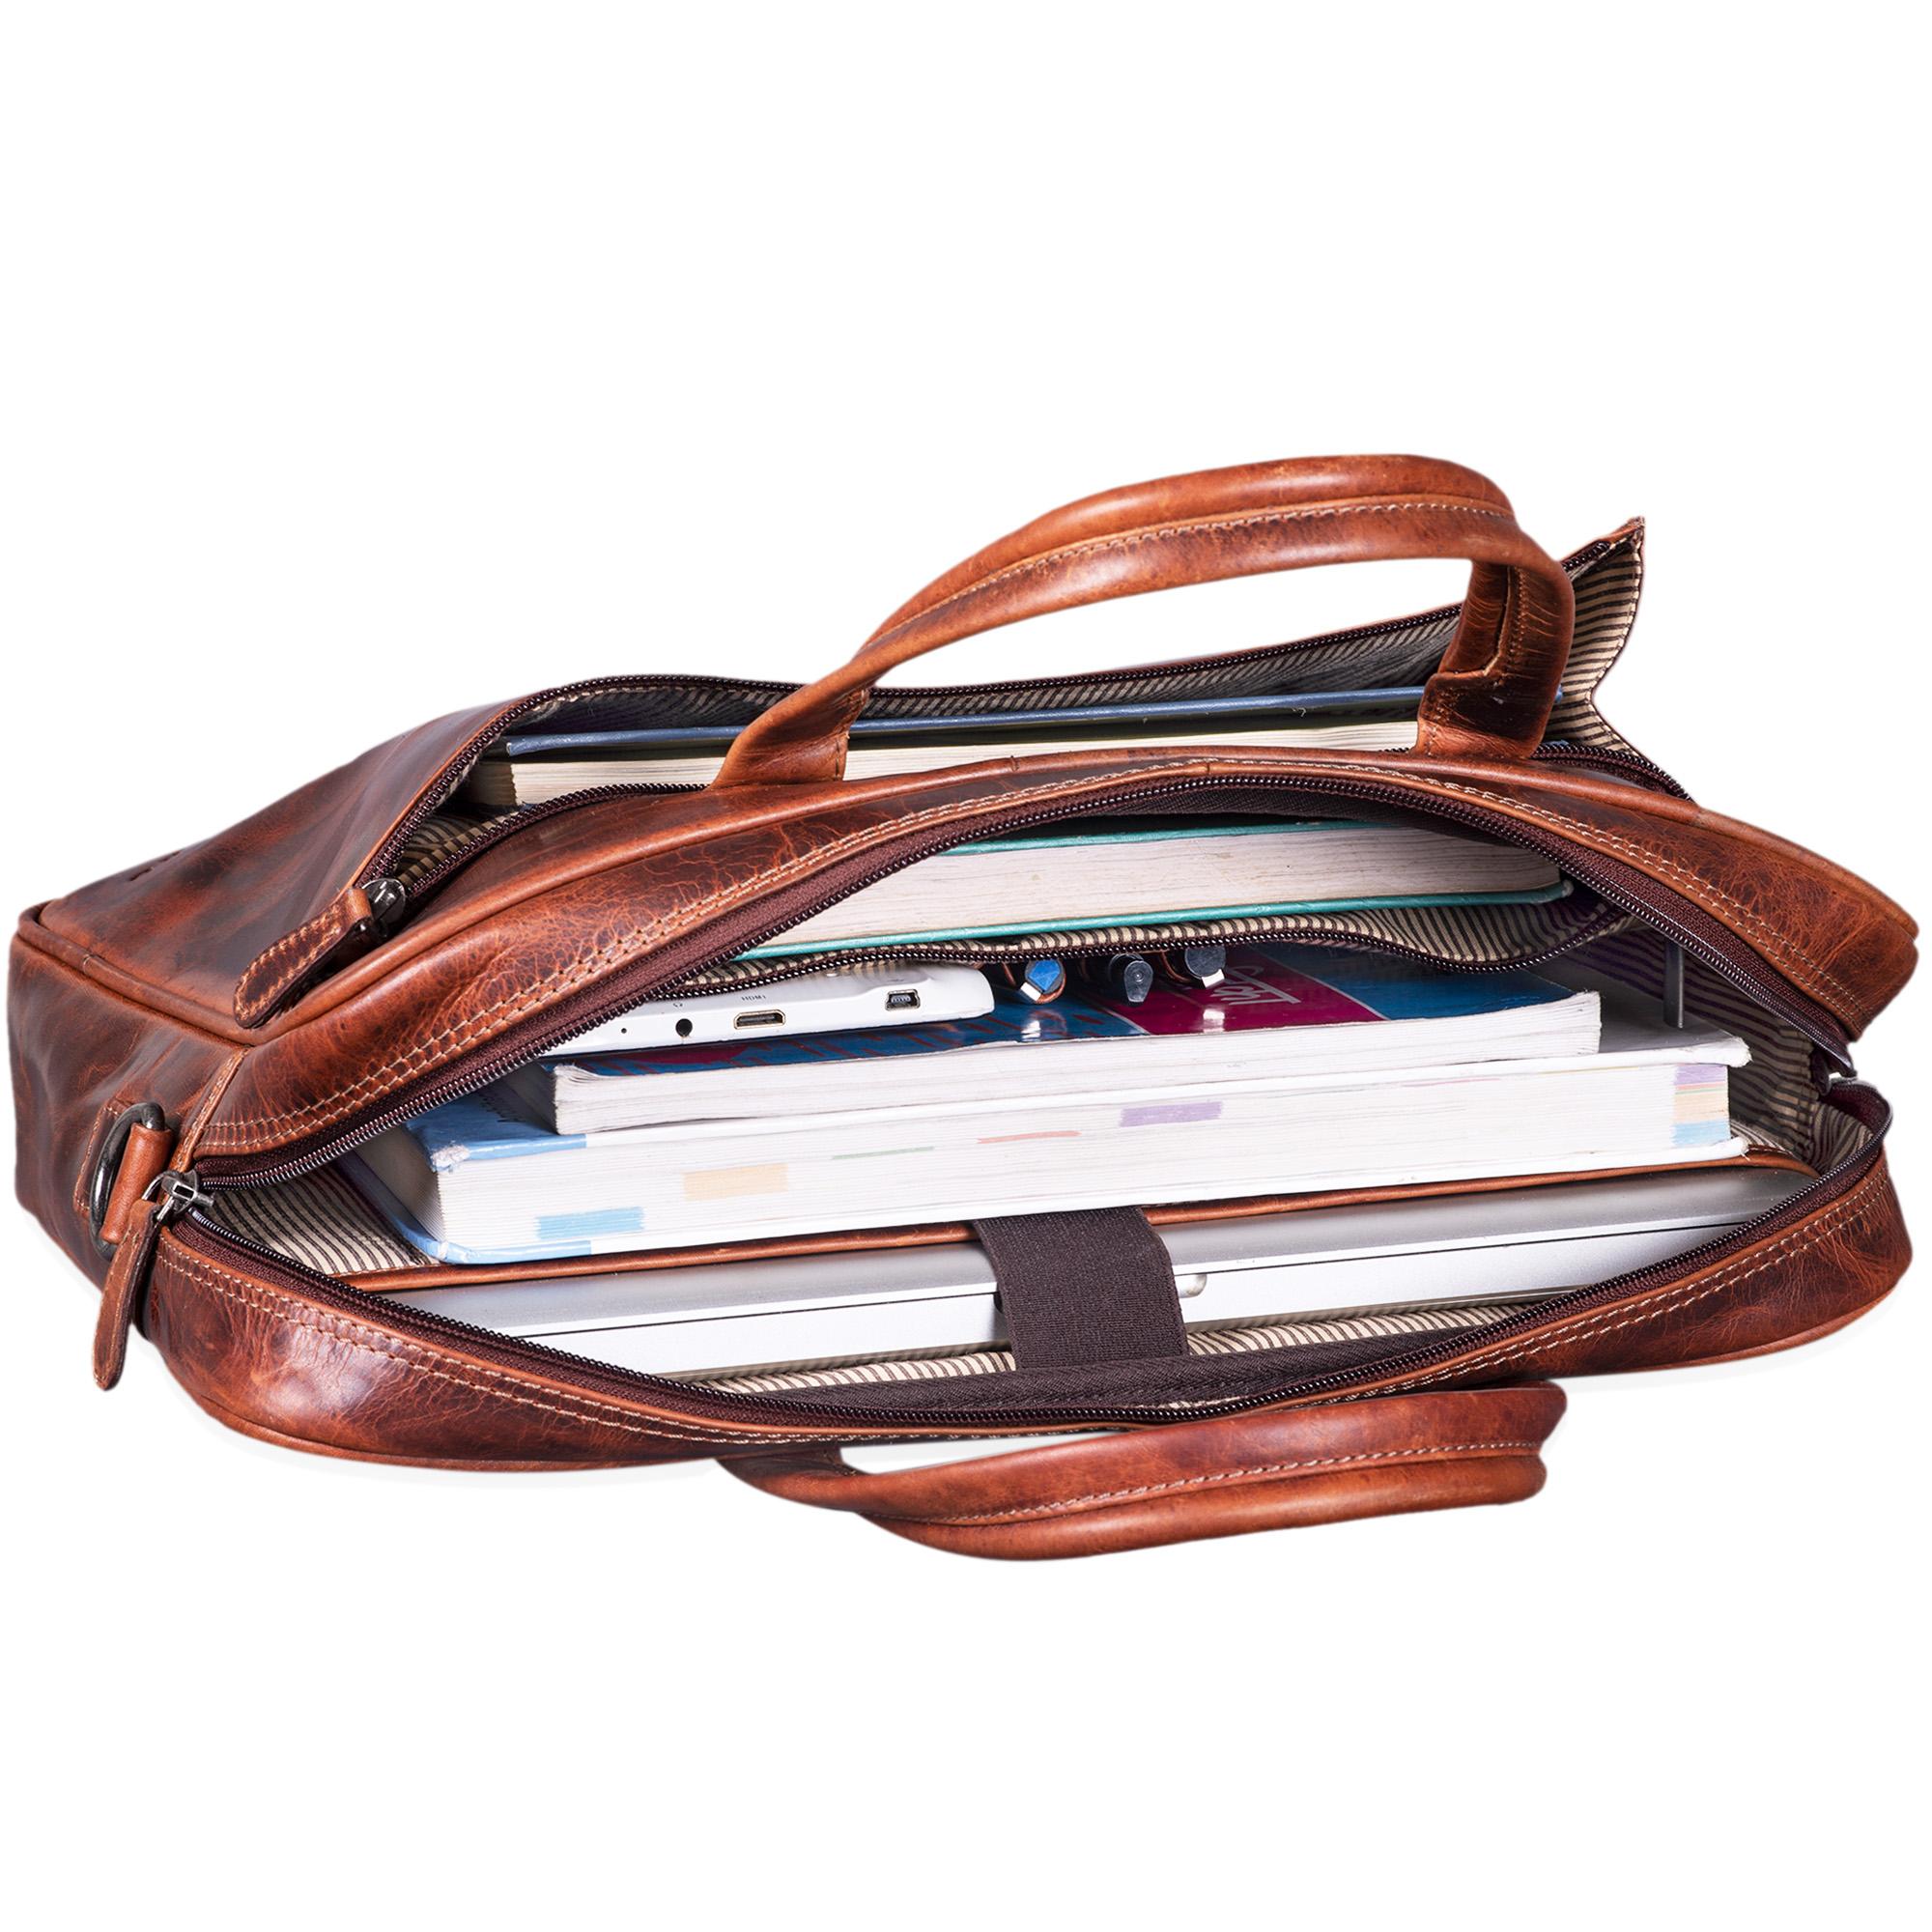 Echtleder Businesstasche elegant groß